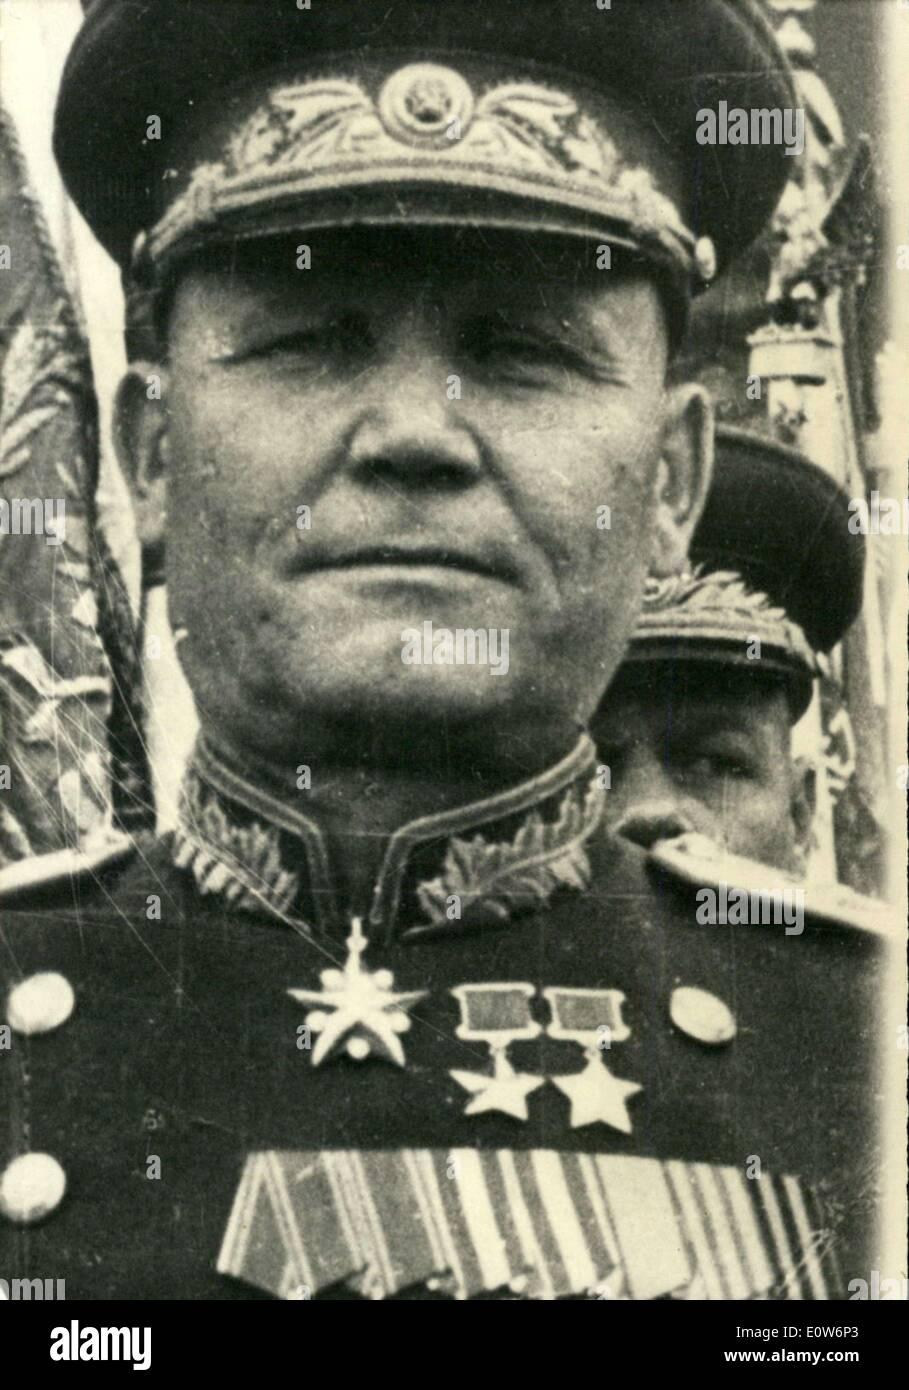 Le 11 août 1961 - Mal Koniev, commandant des troupes russes à Berlin circa 1945 APRESS.co Photo Stock